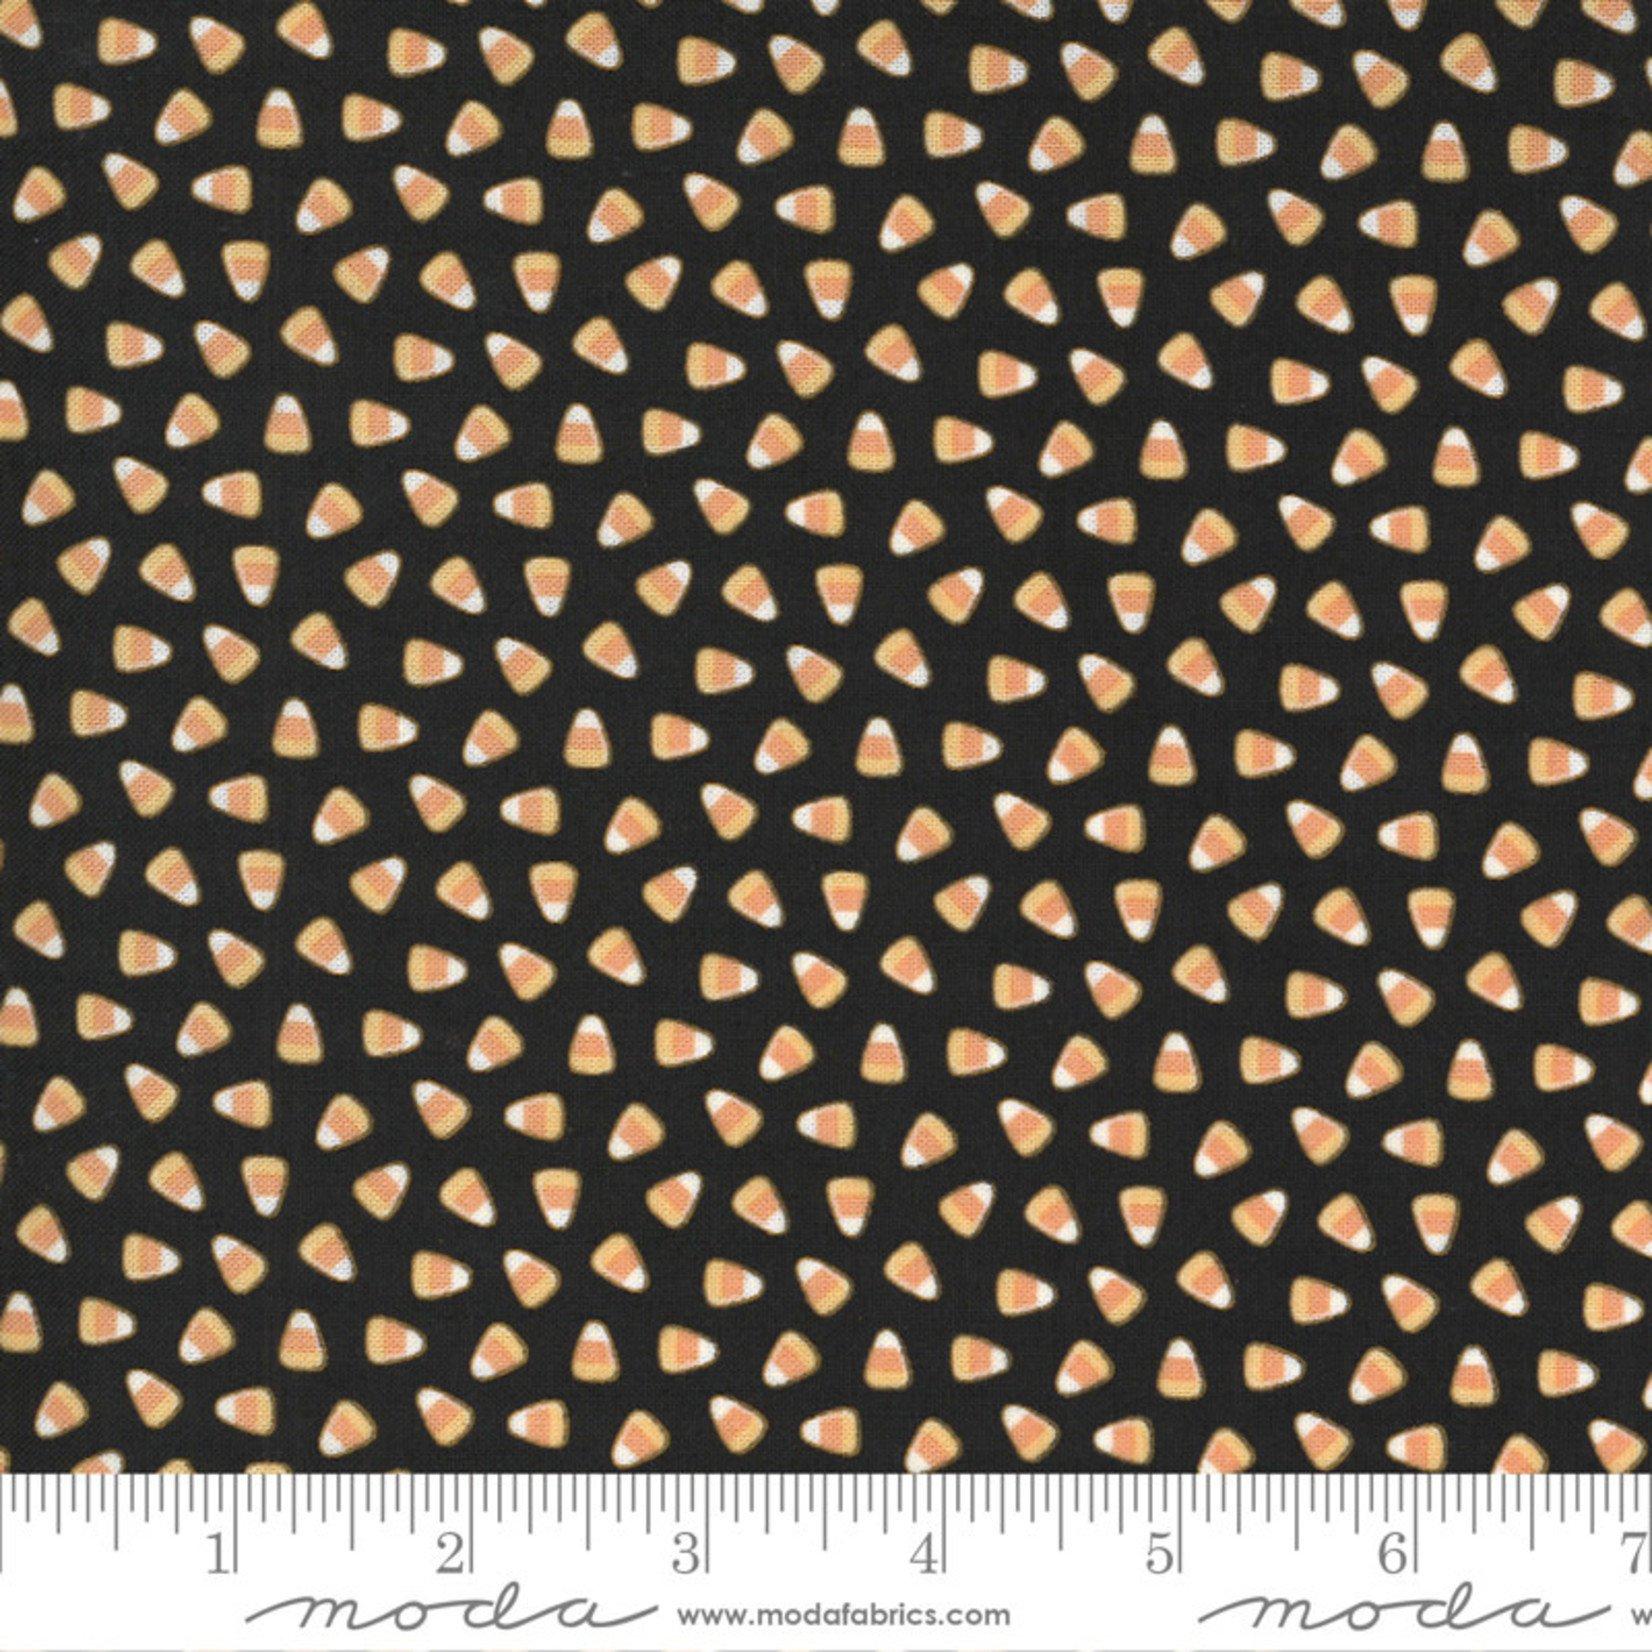 Urban Chiks Kitty Corn, Candy Corn, Midnight 31175-17 $0.20 per cm or $20/m